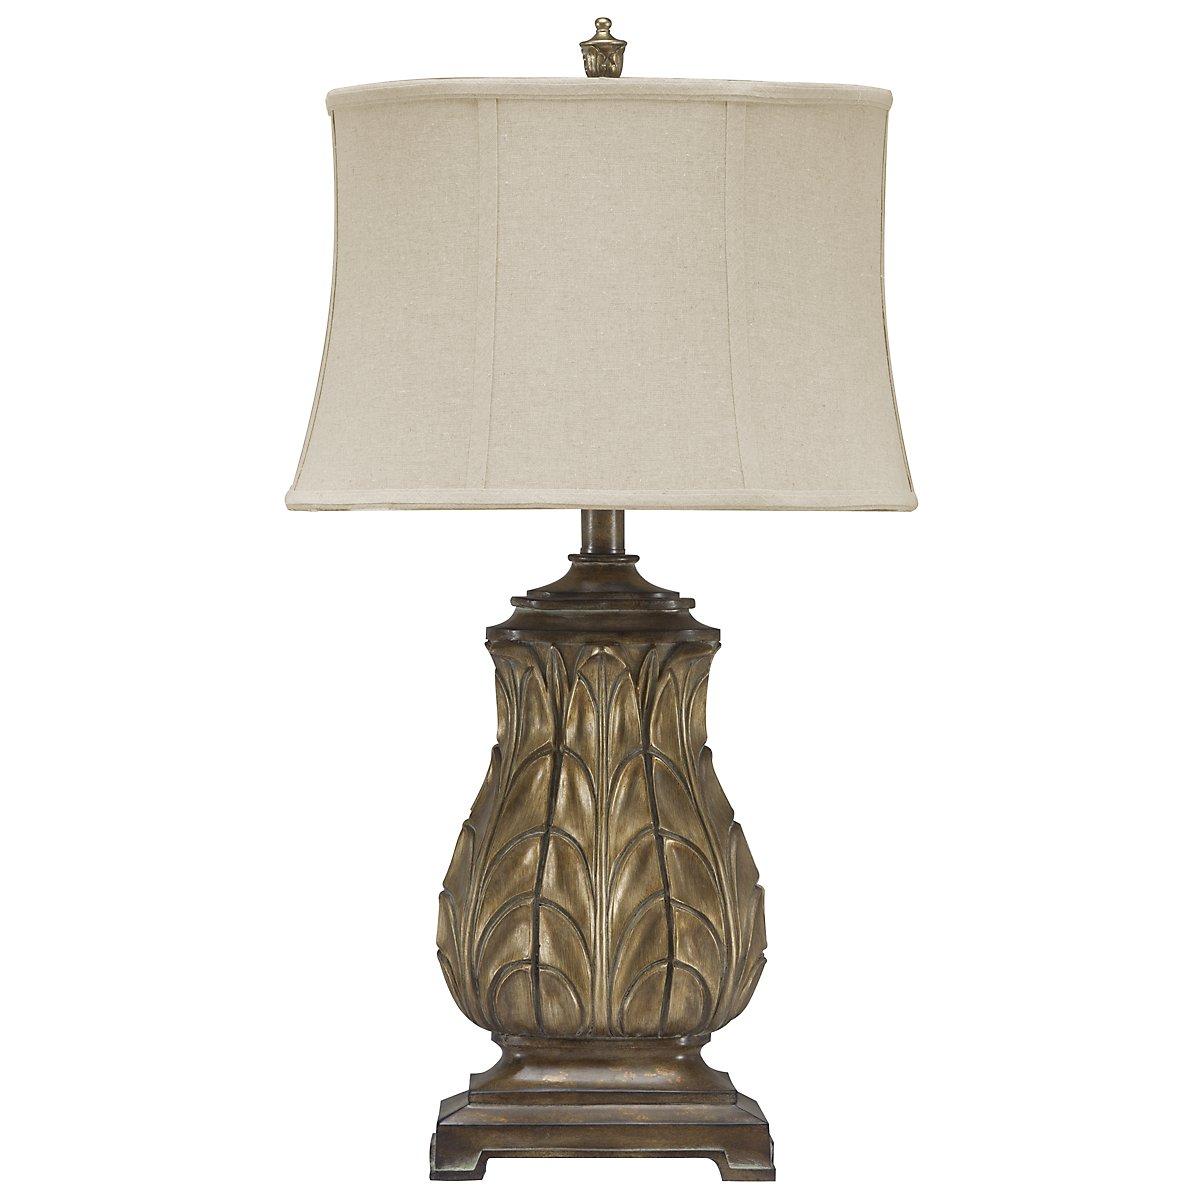 Tori Gold Table Lamp